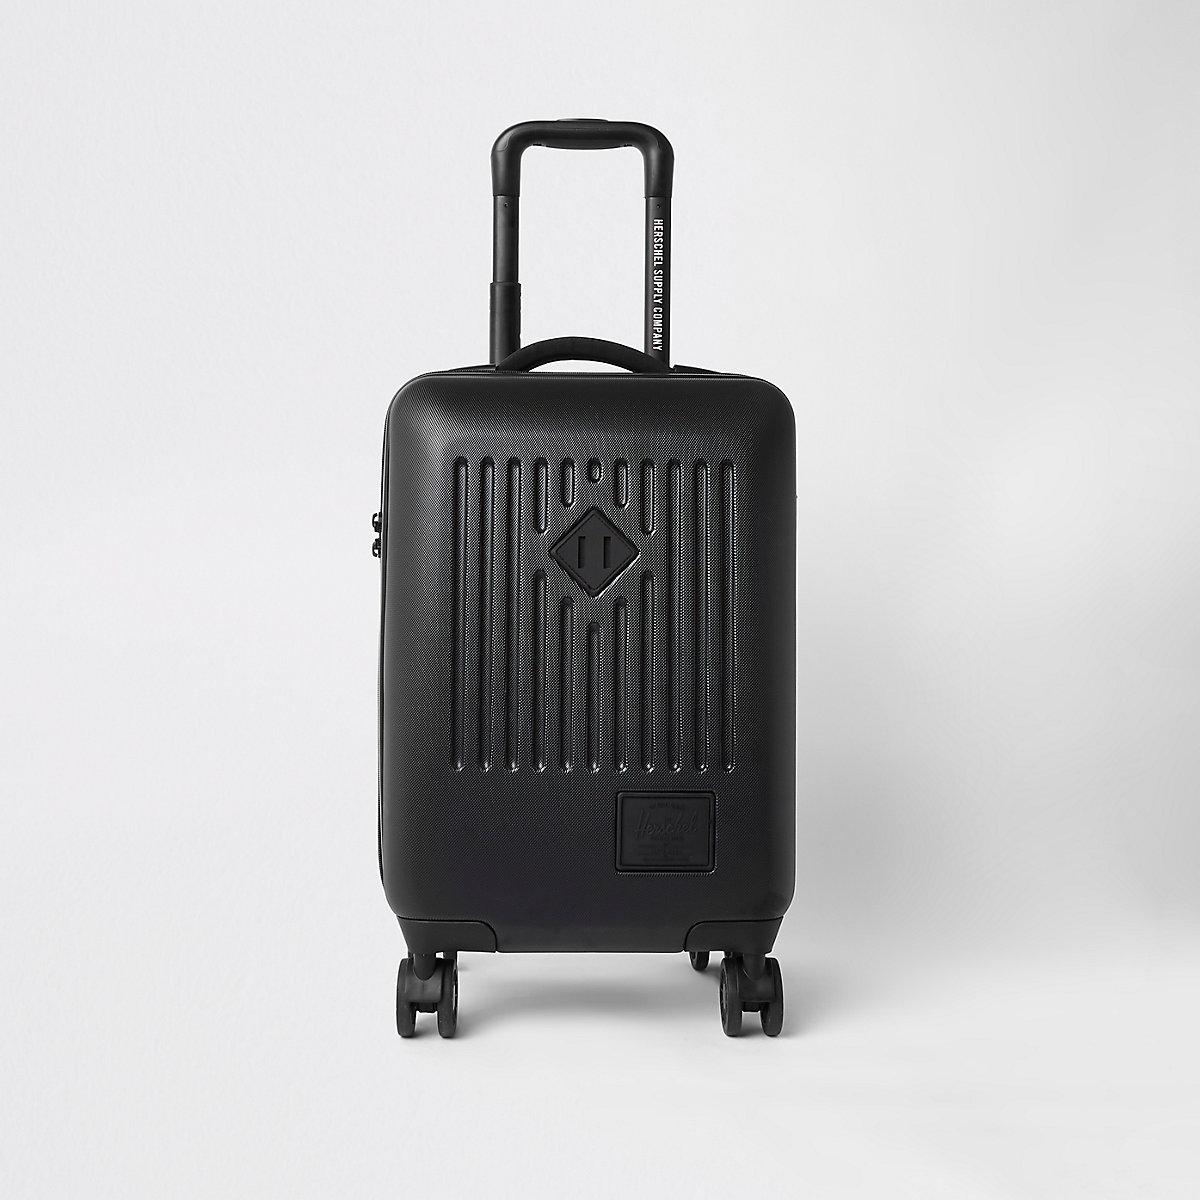 Herschel black trade carry on suitcase